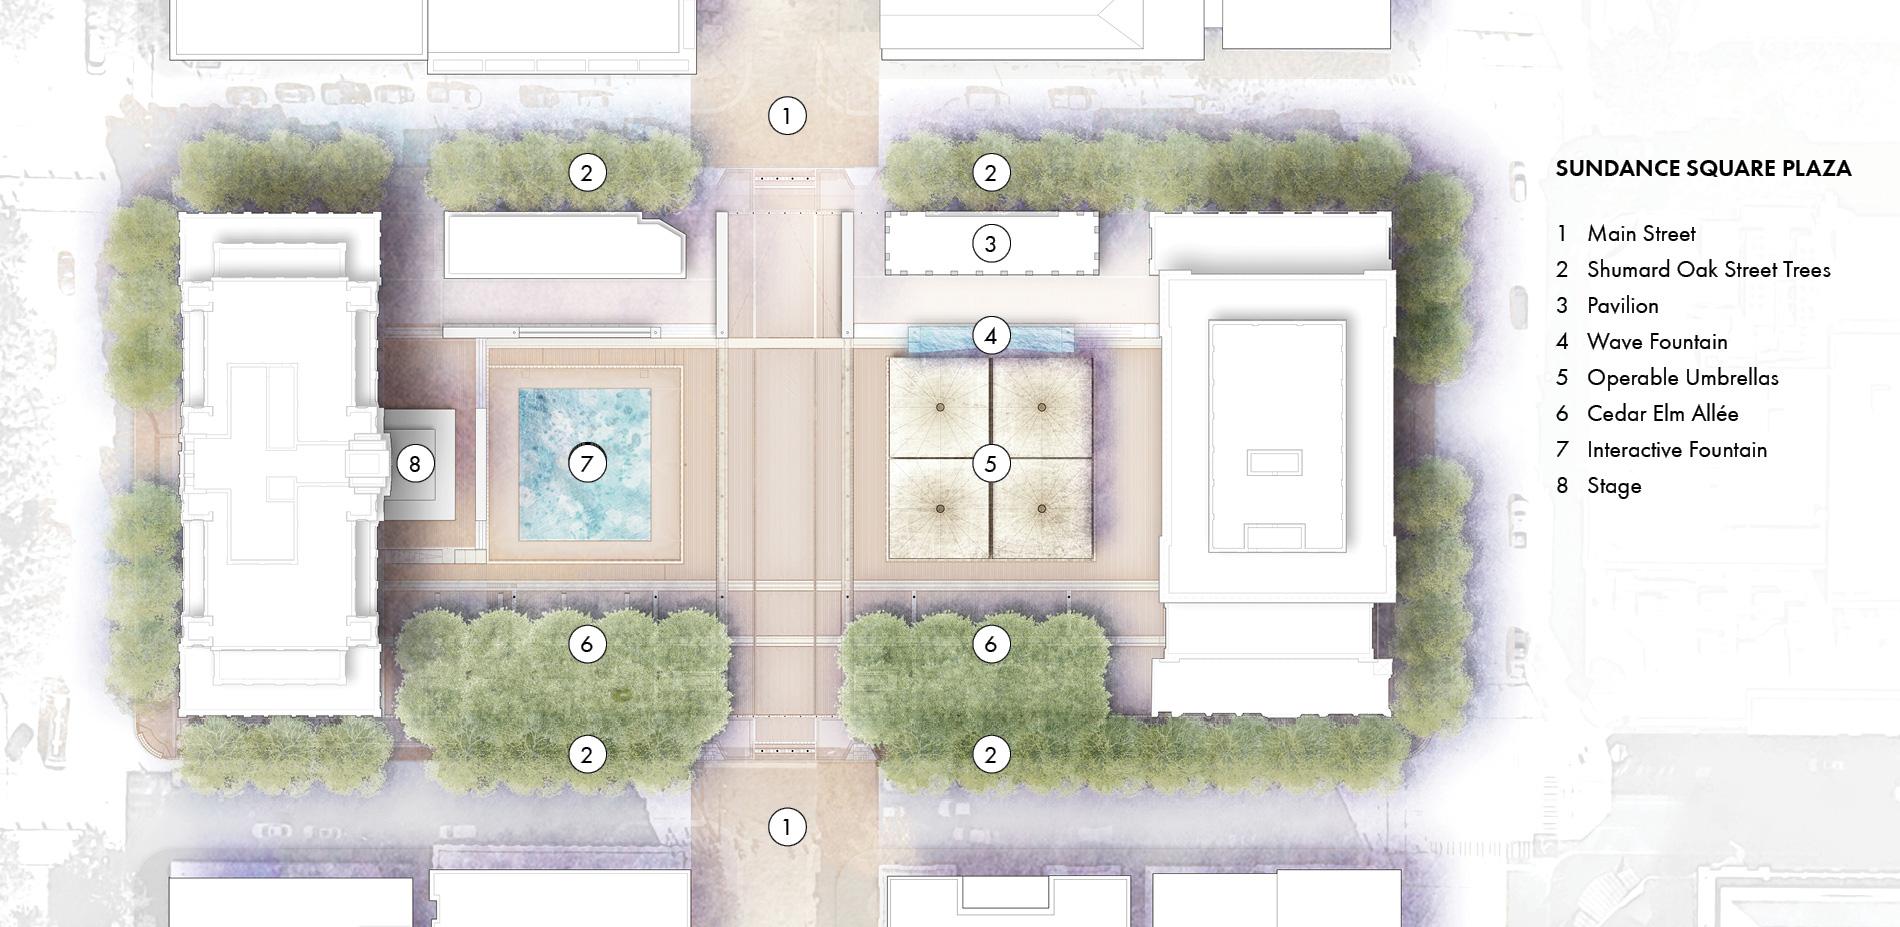 Sundance Square Plaza, The Heart of Fort Worth   2019 ASLA Professional Awards